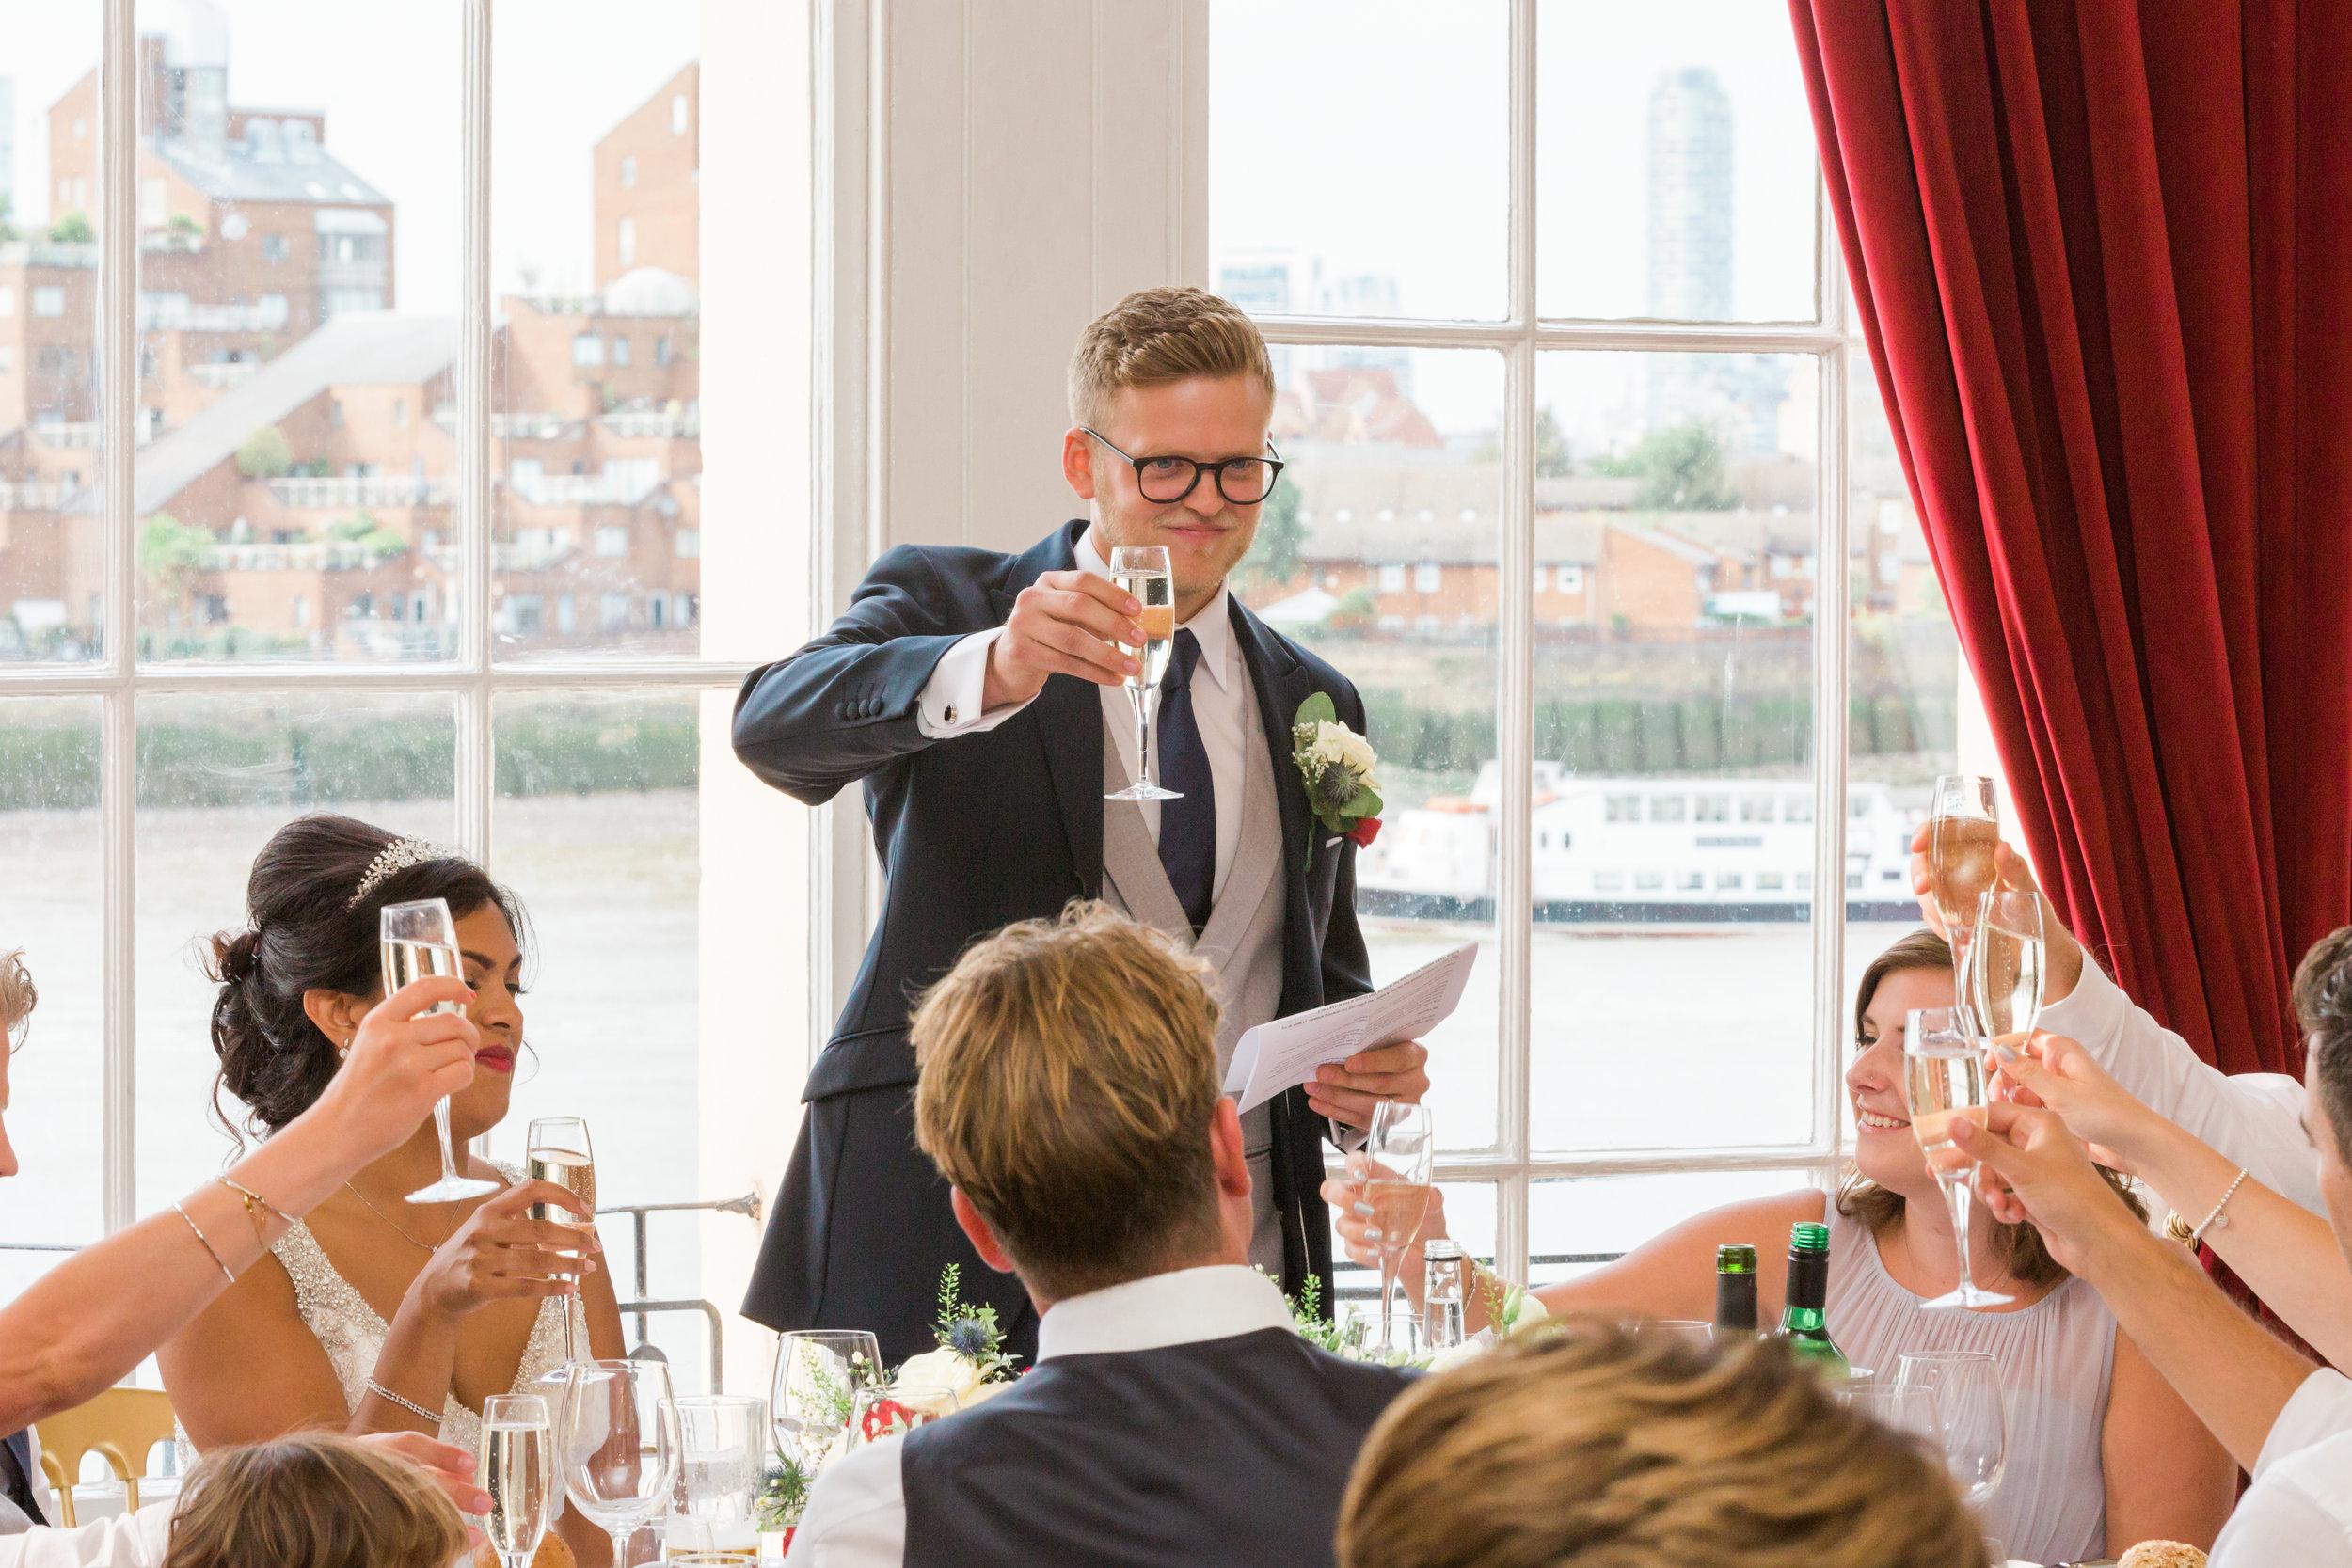 the-wedding-speech.jpg